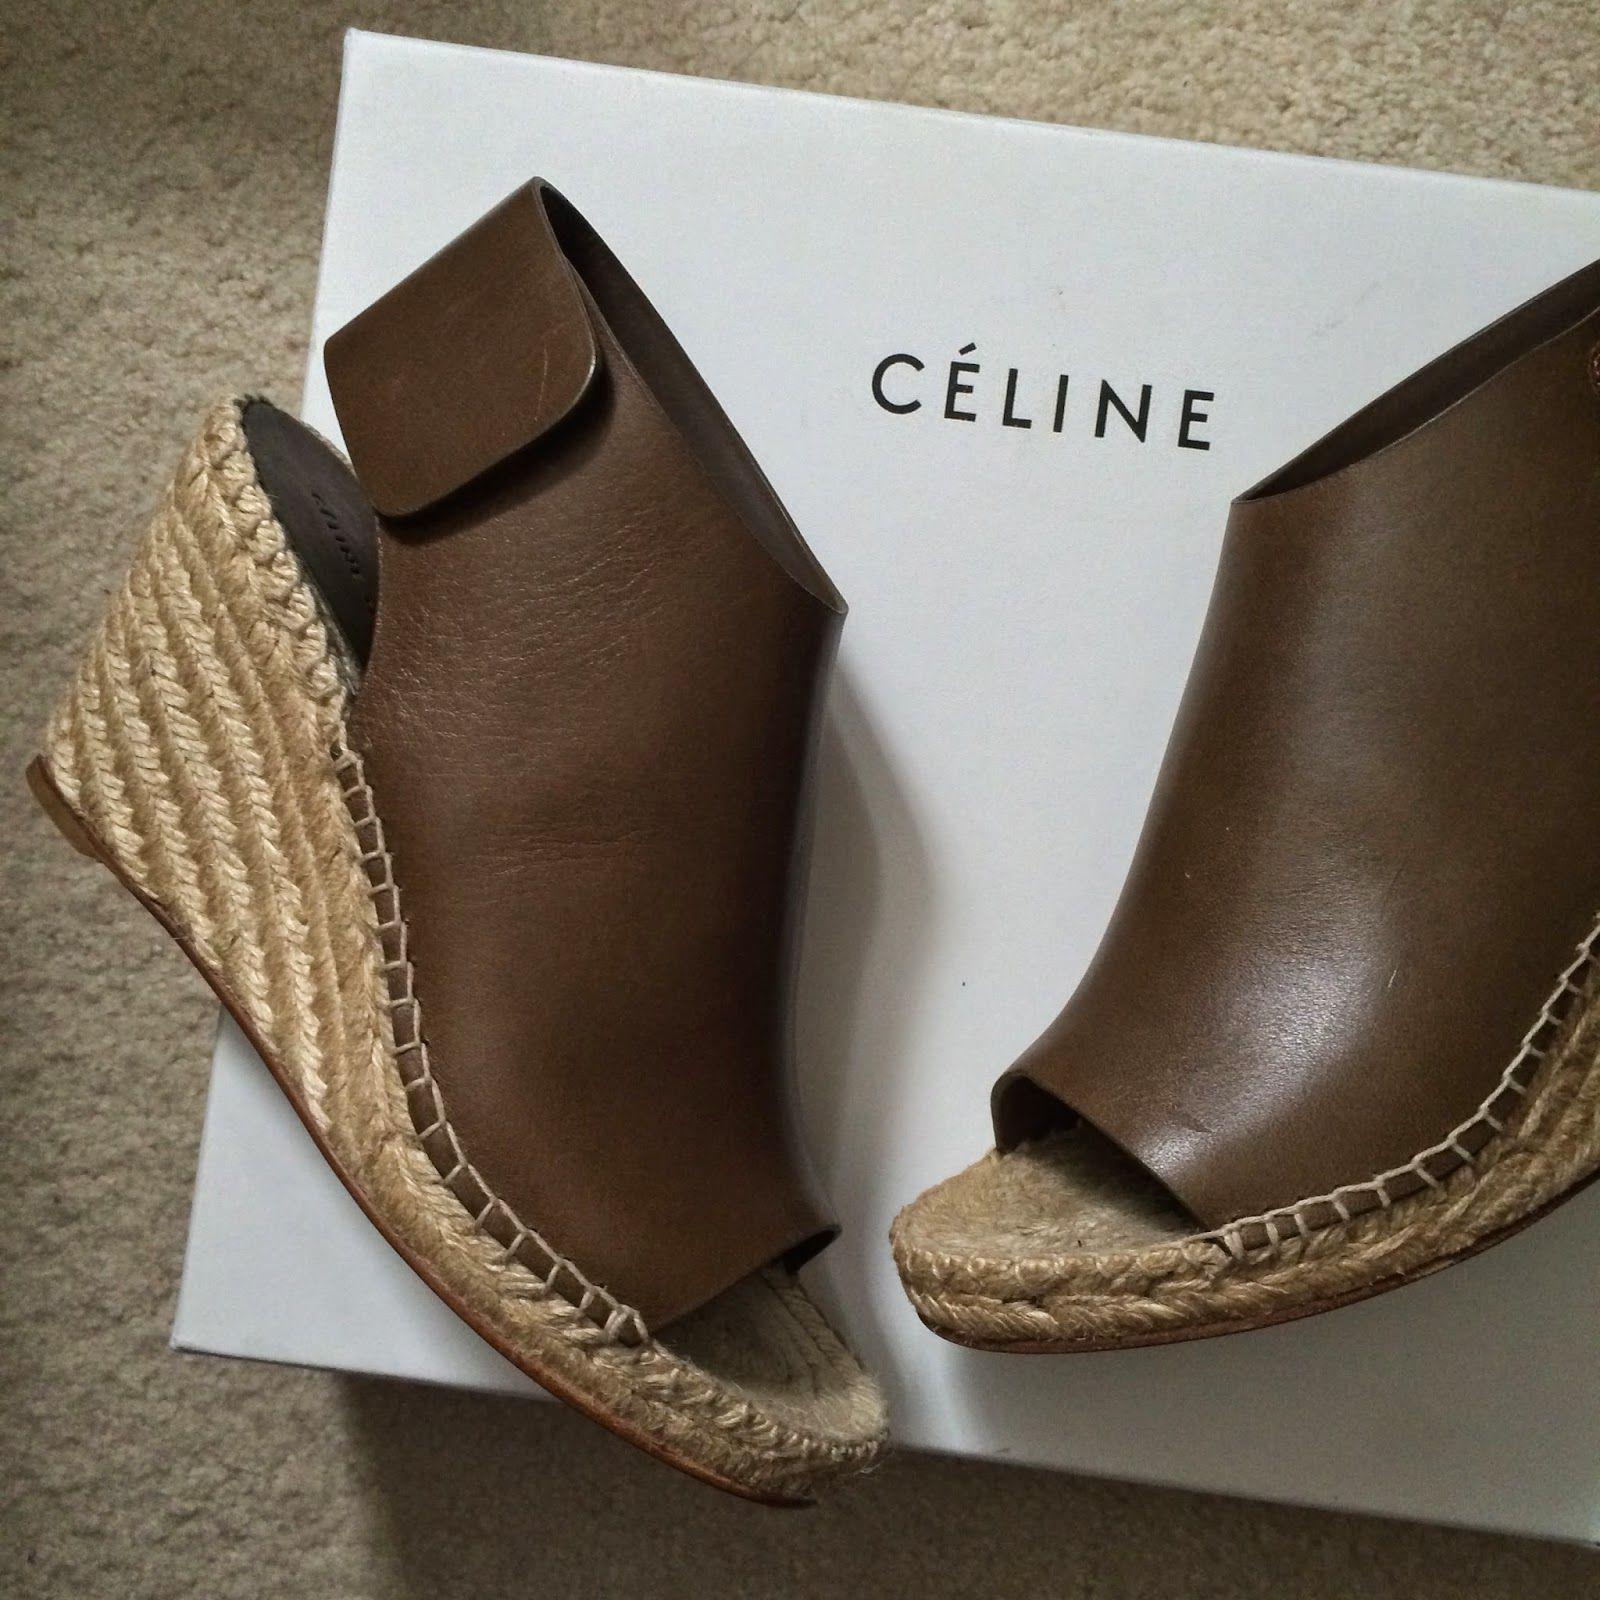 New in: CELINE Espadrille Wedges   Shoes   Pinterest ...